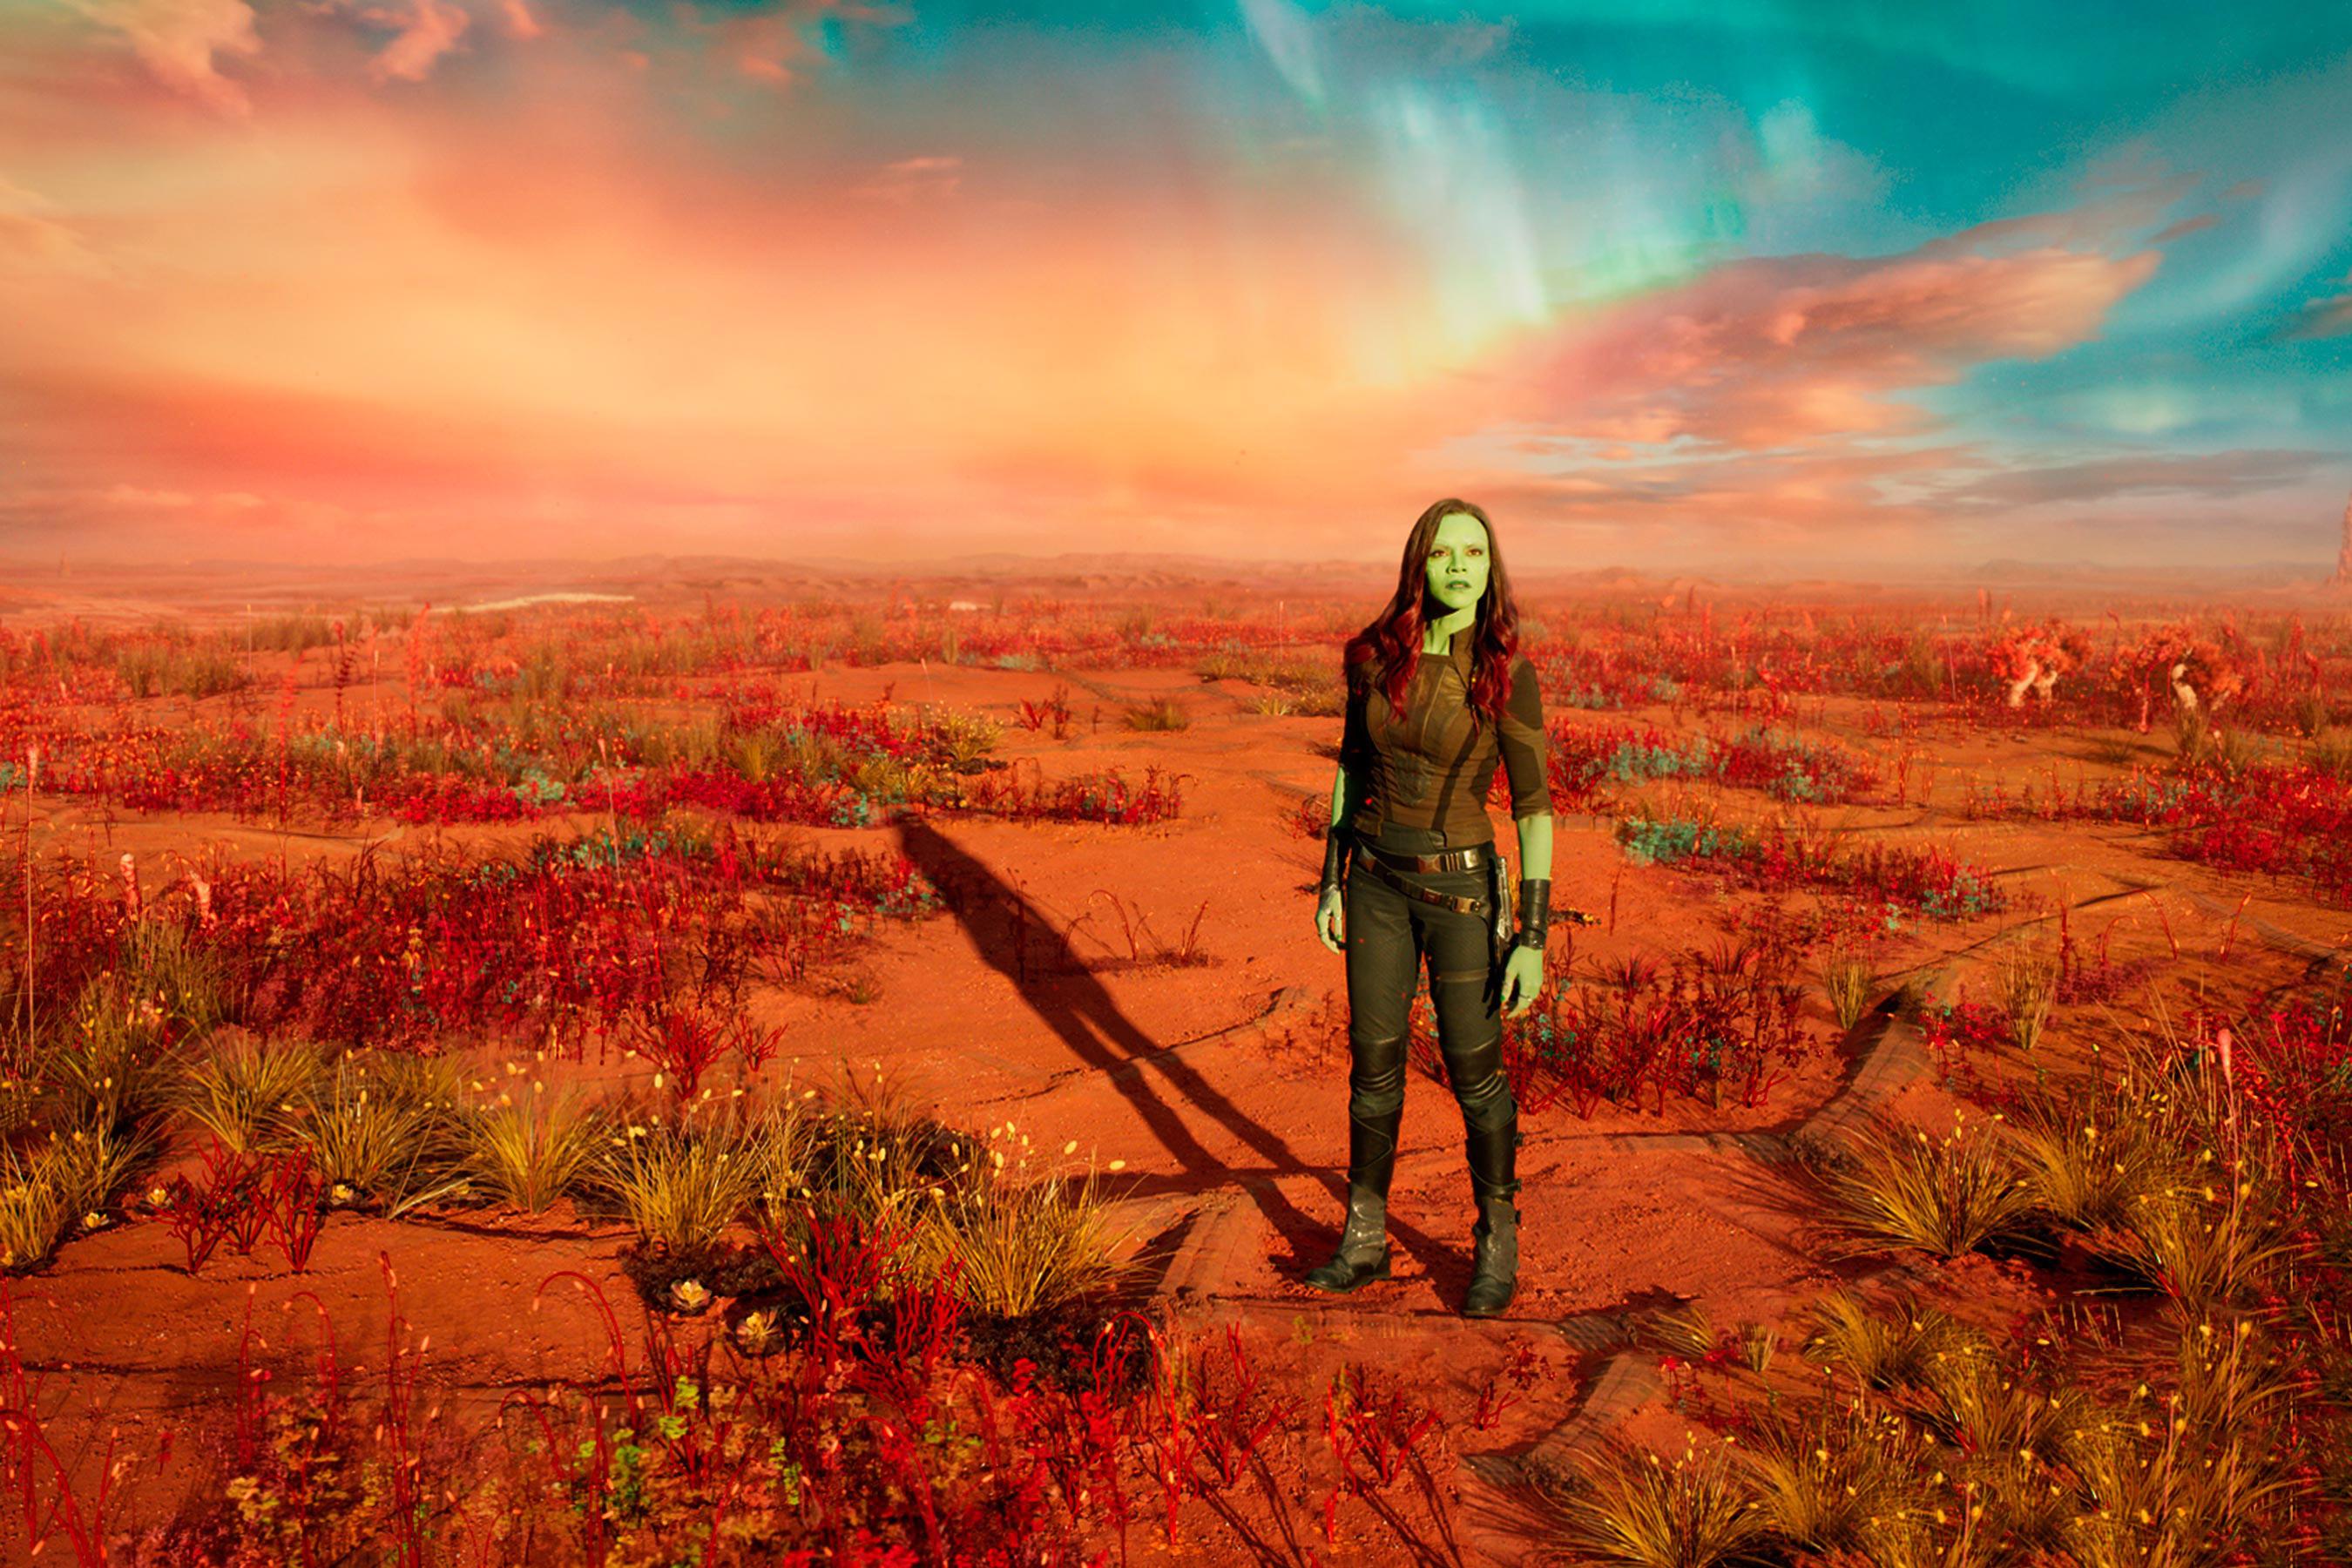 Zoe Saldana As Gamora In Guardians Of Galaxy Vol 2 Hd Movies 4k